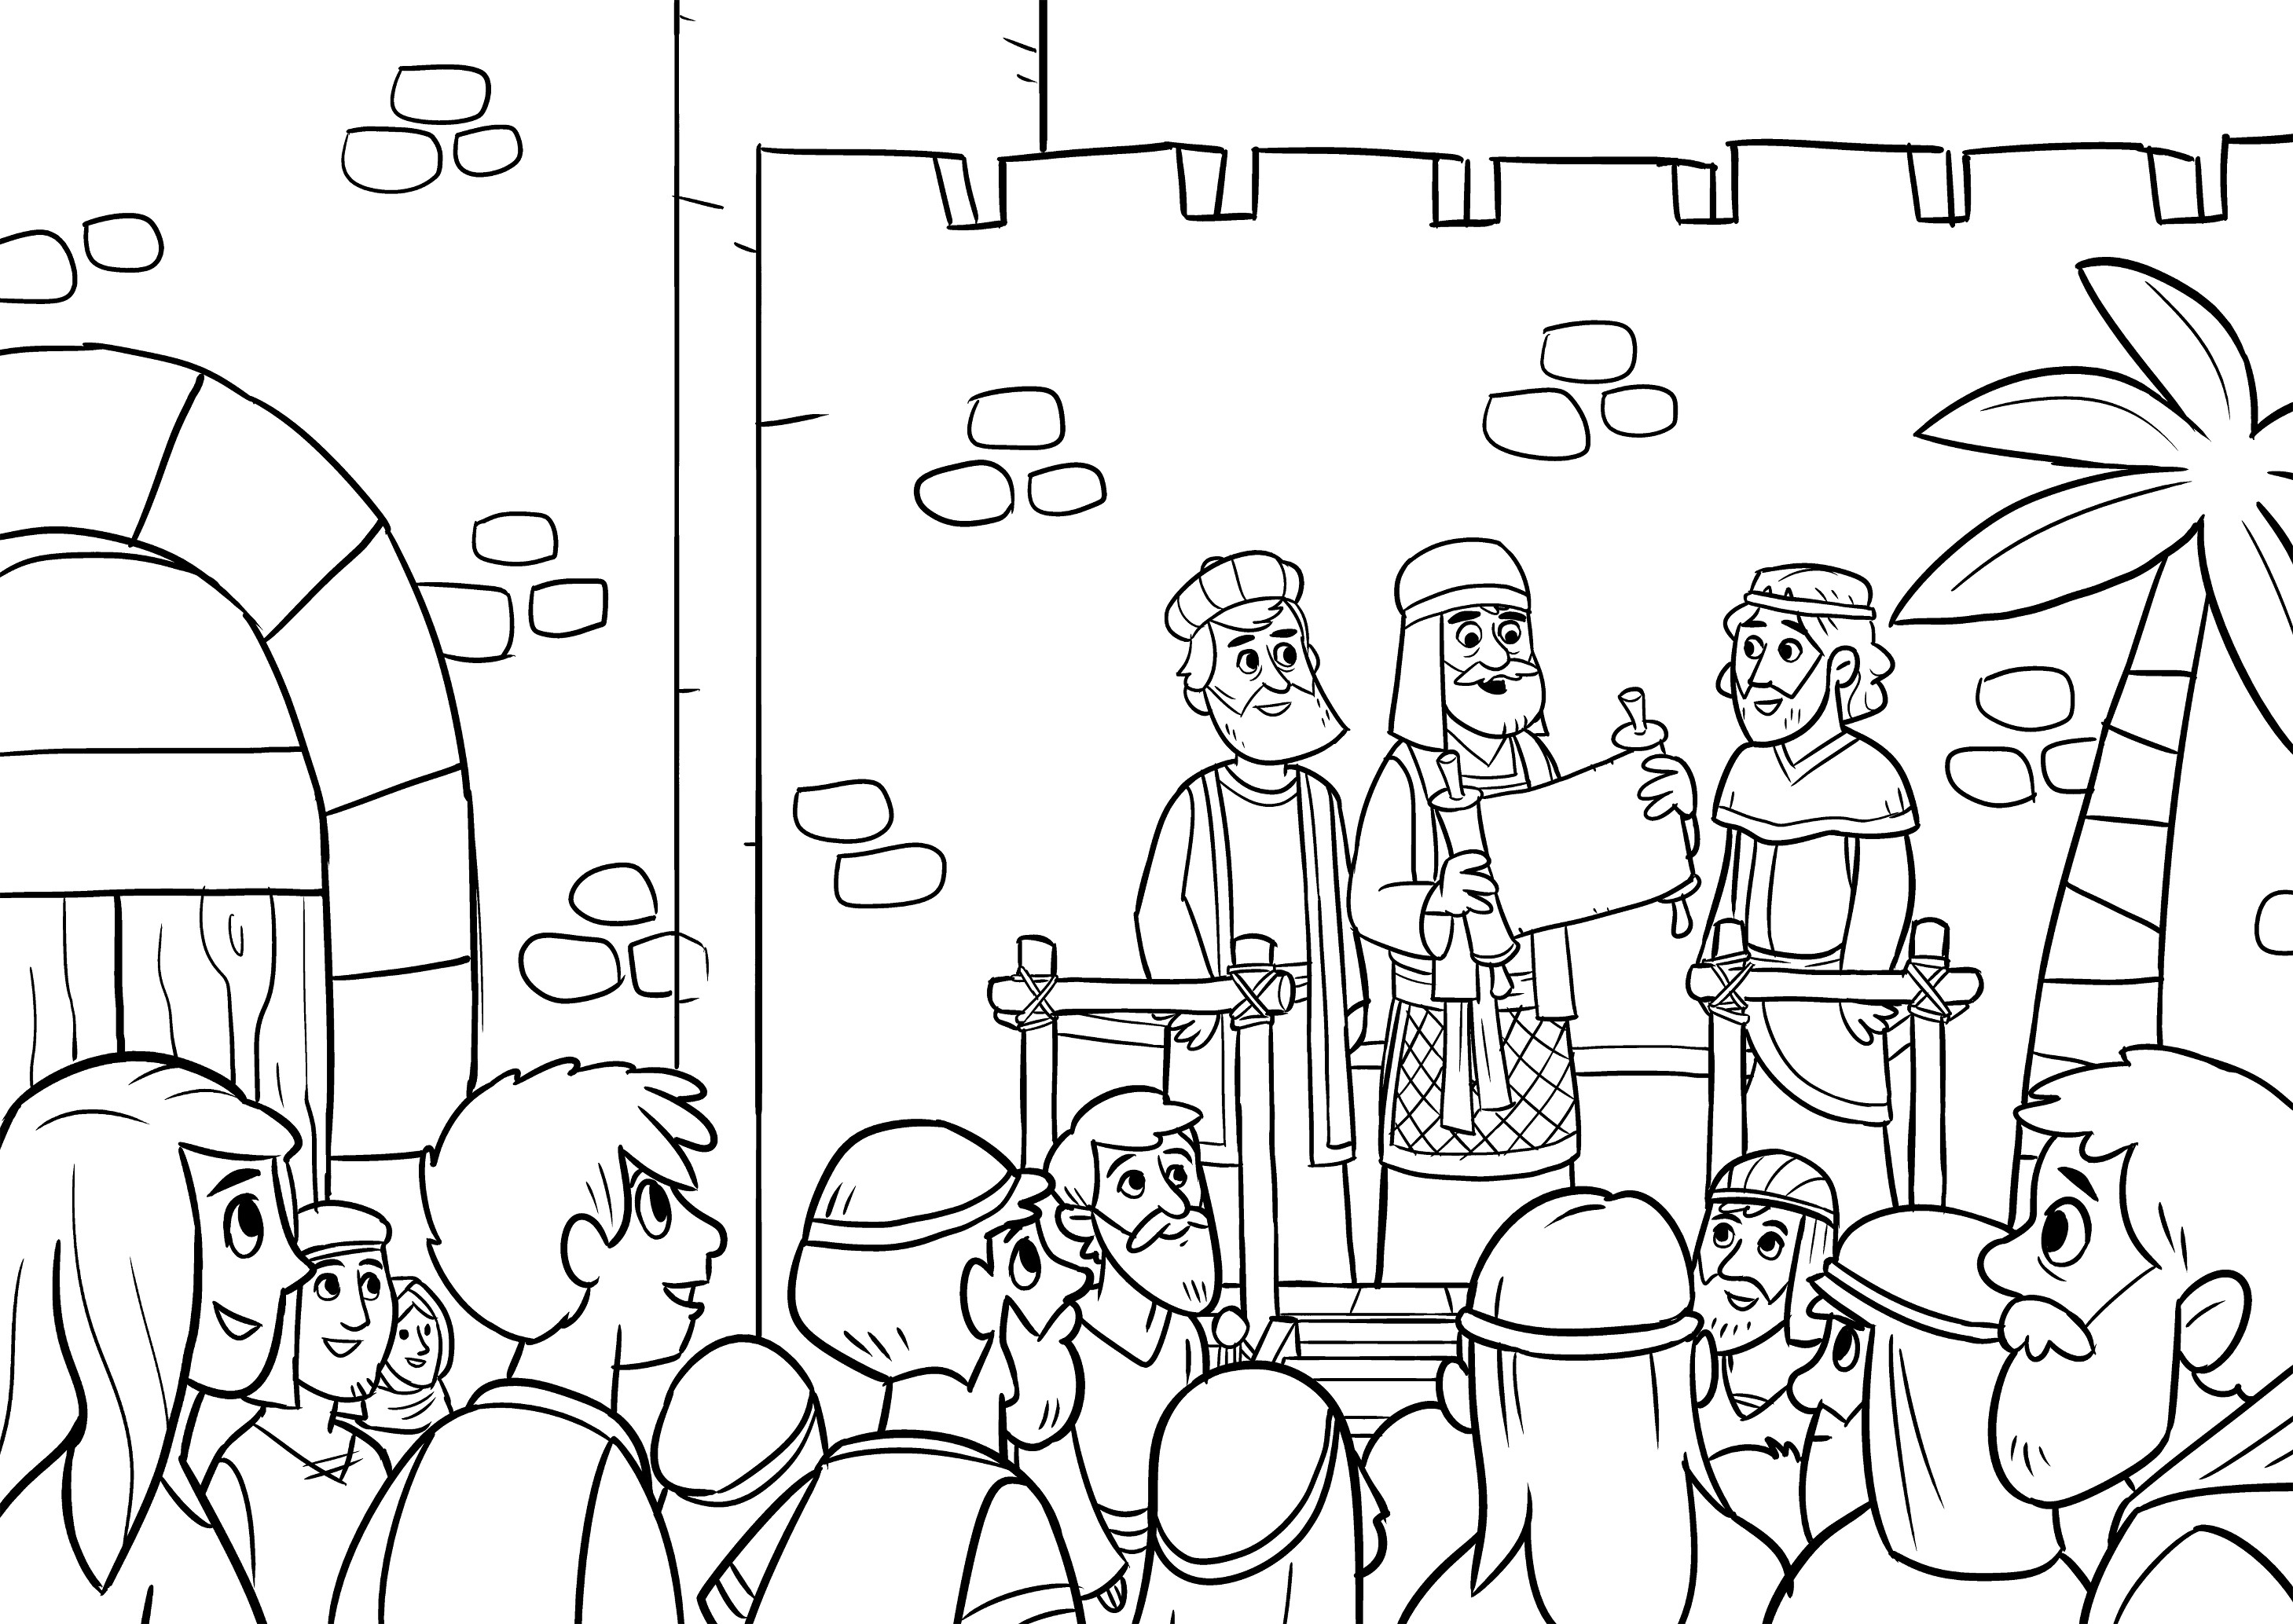 nehemiah coloring pages nehemiah worksheet bible lessons bible lessons for nehemiah pages coloring